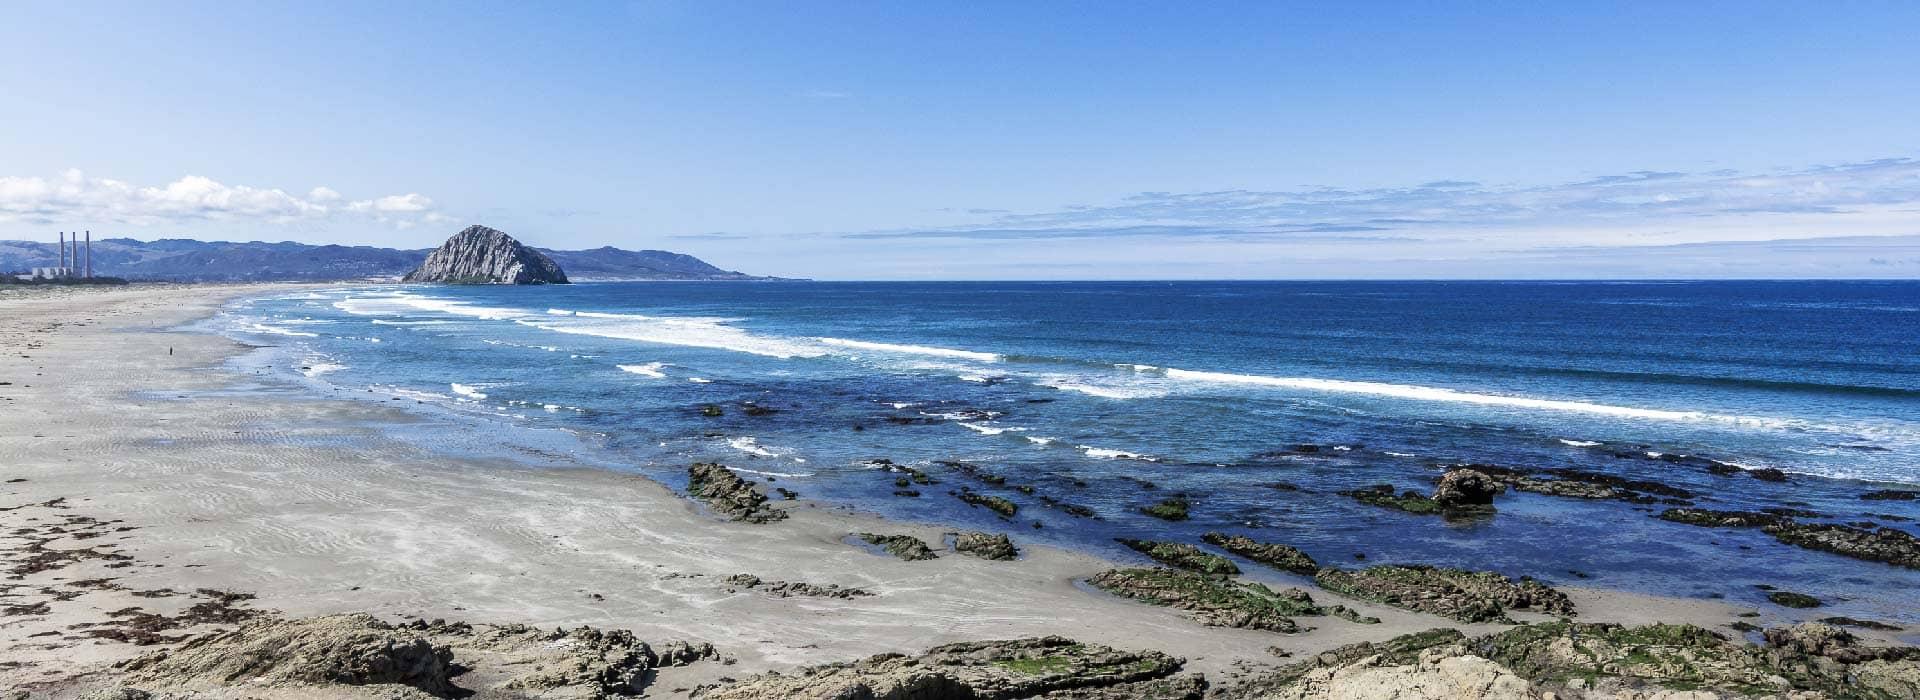 Urelax Vacation Rentals Morro Bay Vacation Rentals